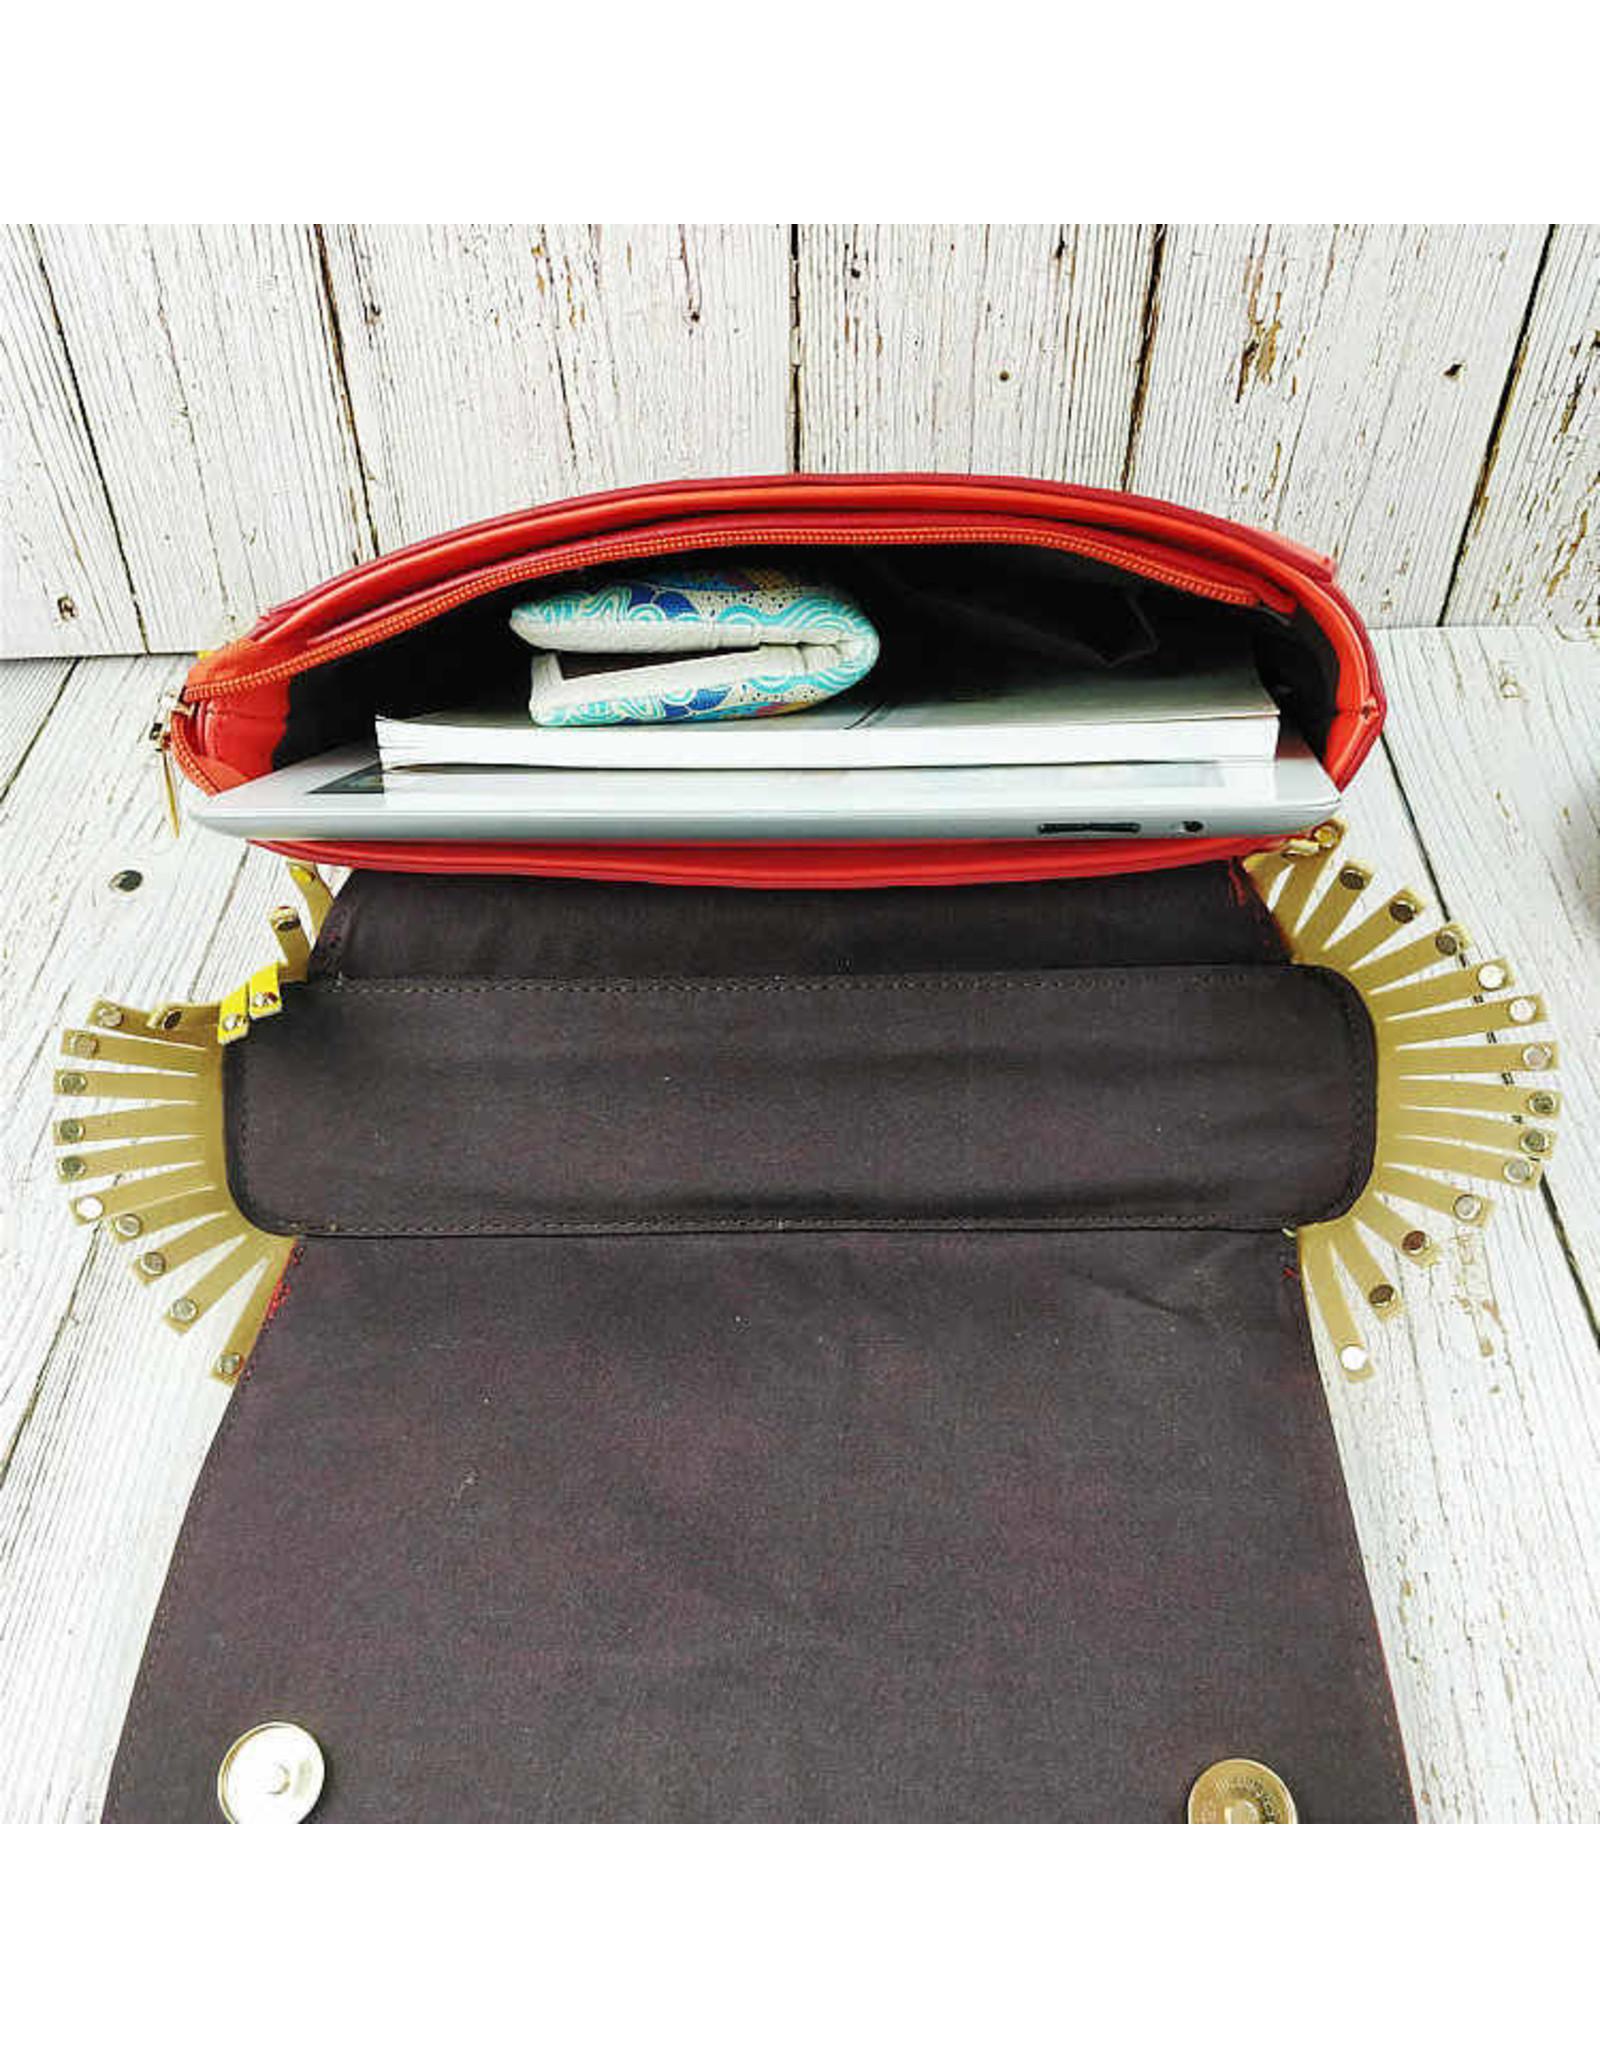 Ameiliyar Fantasy bags and wallets - Ameiliyar Fantasy bag Admiral jacket